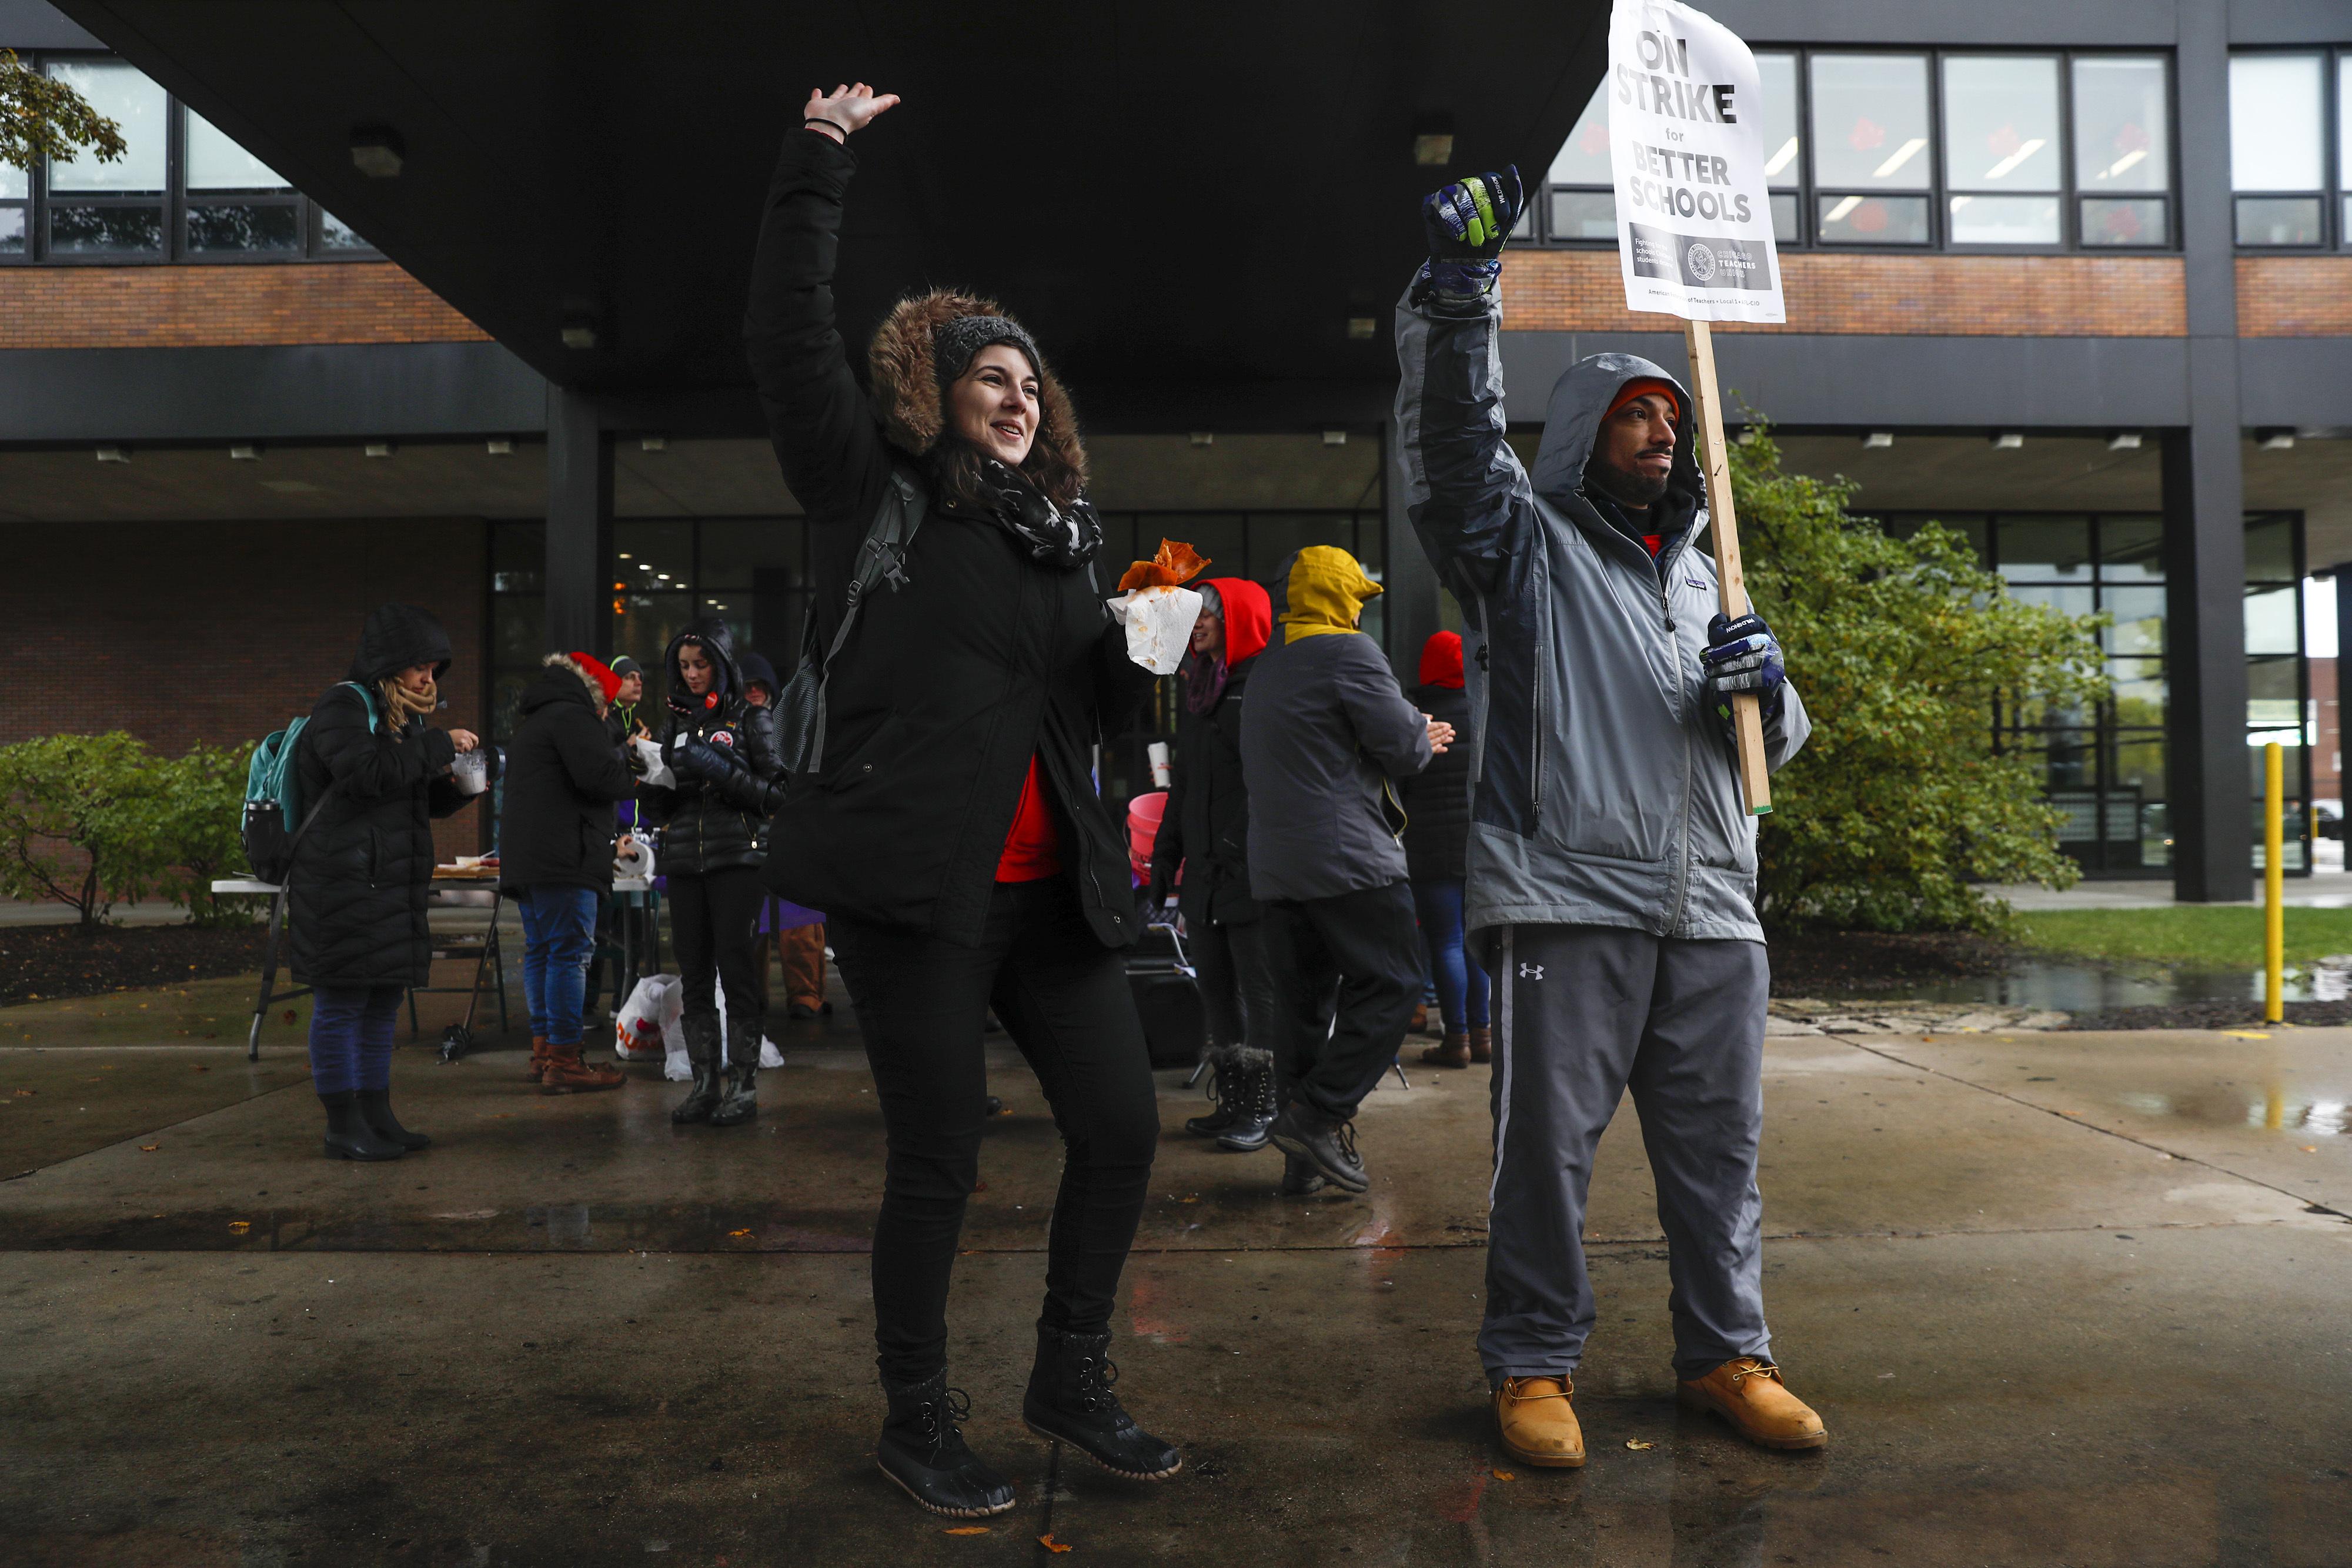 Chicago teachers OK tentative agreement but strike goes on